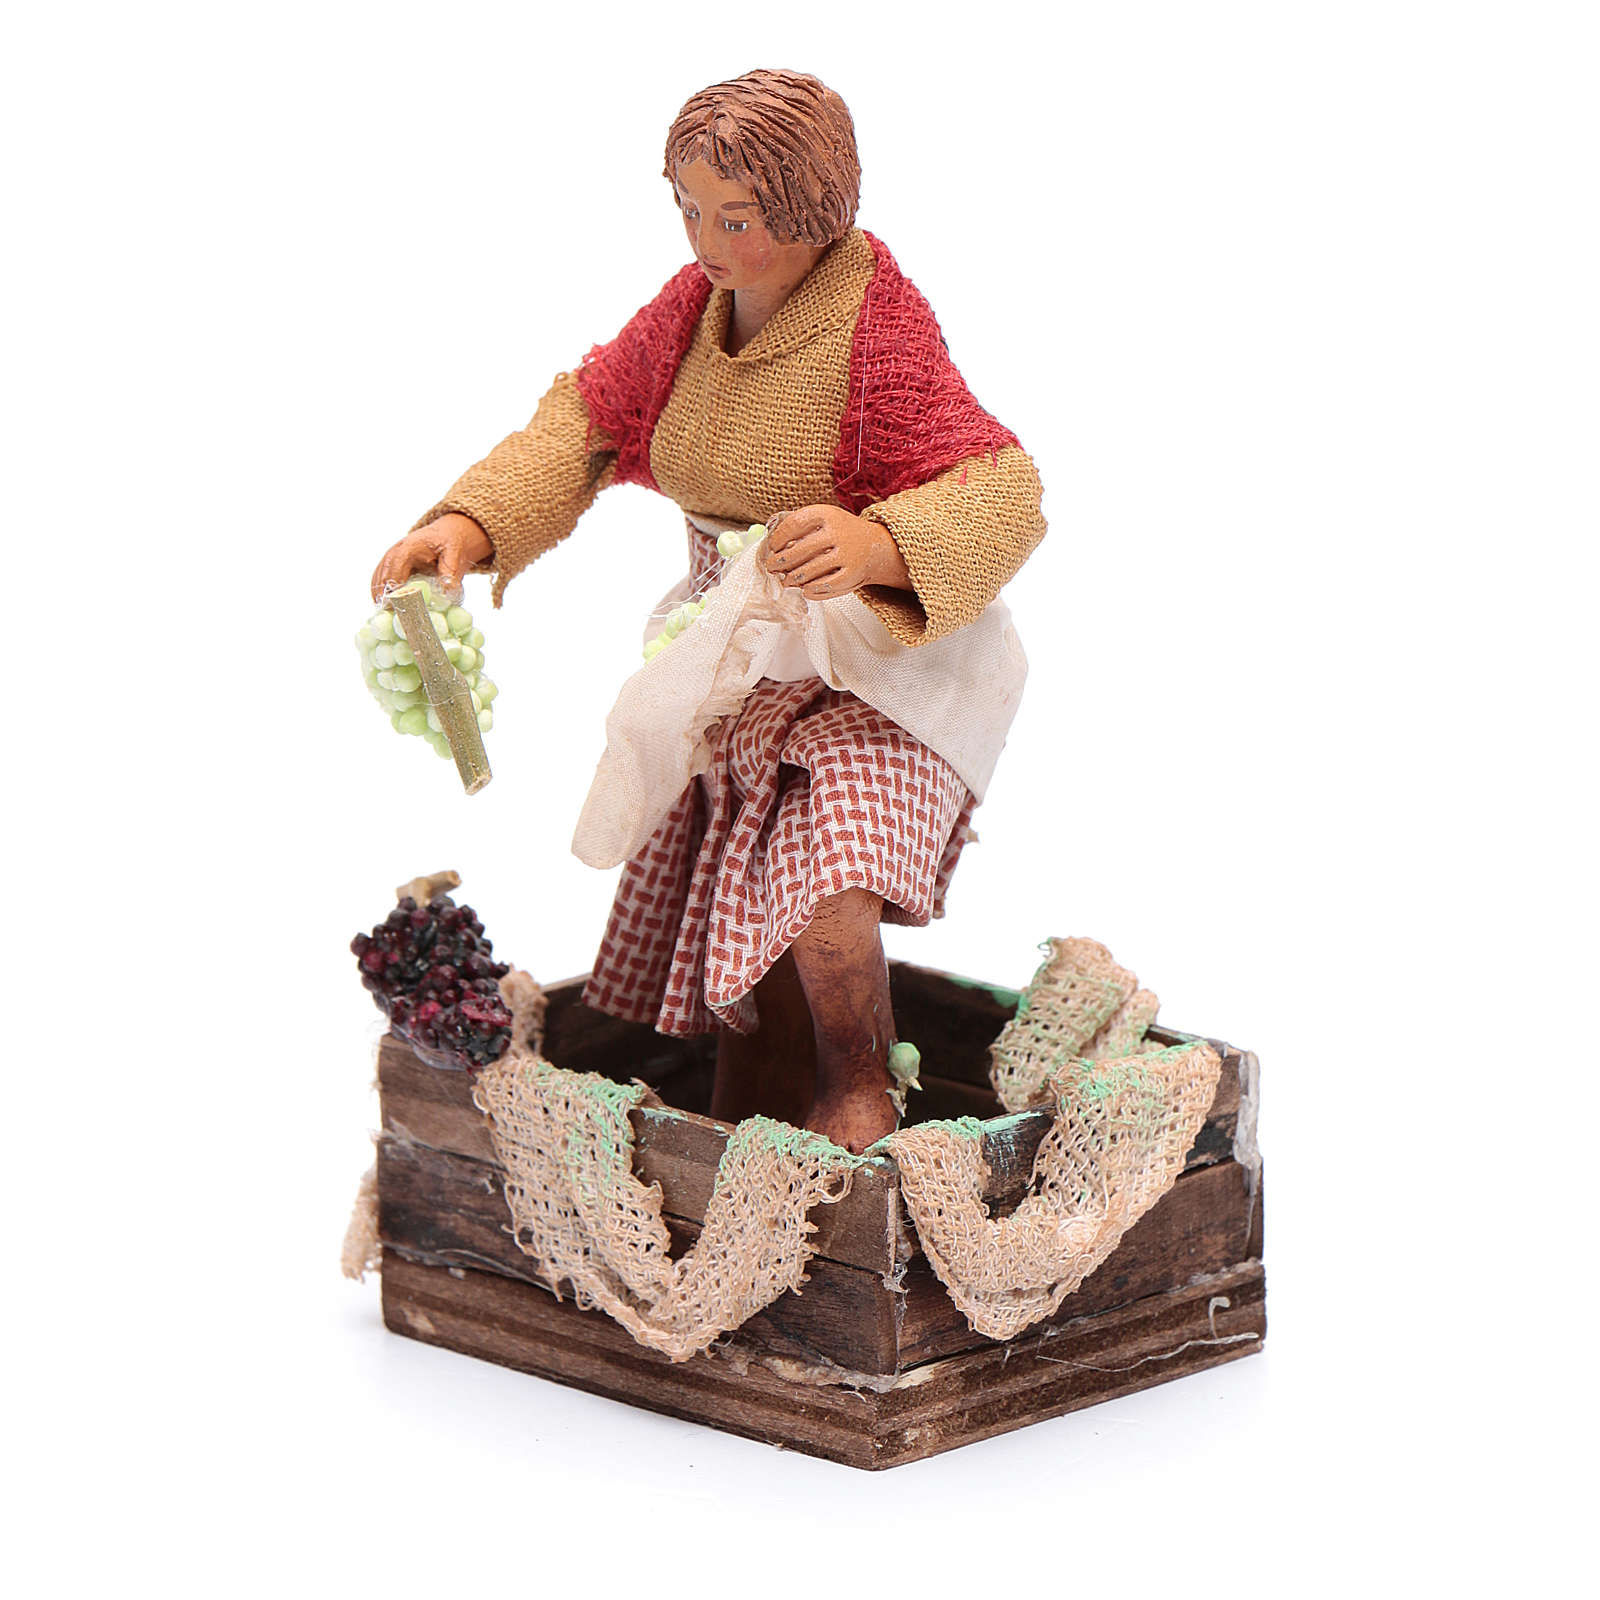 Donna mentre pigia uva 12 cm presepe napoletano 4